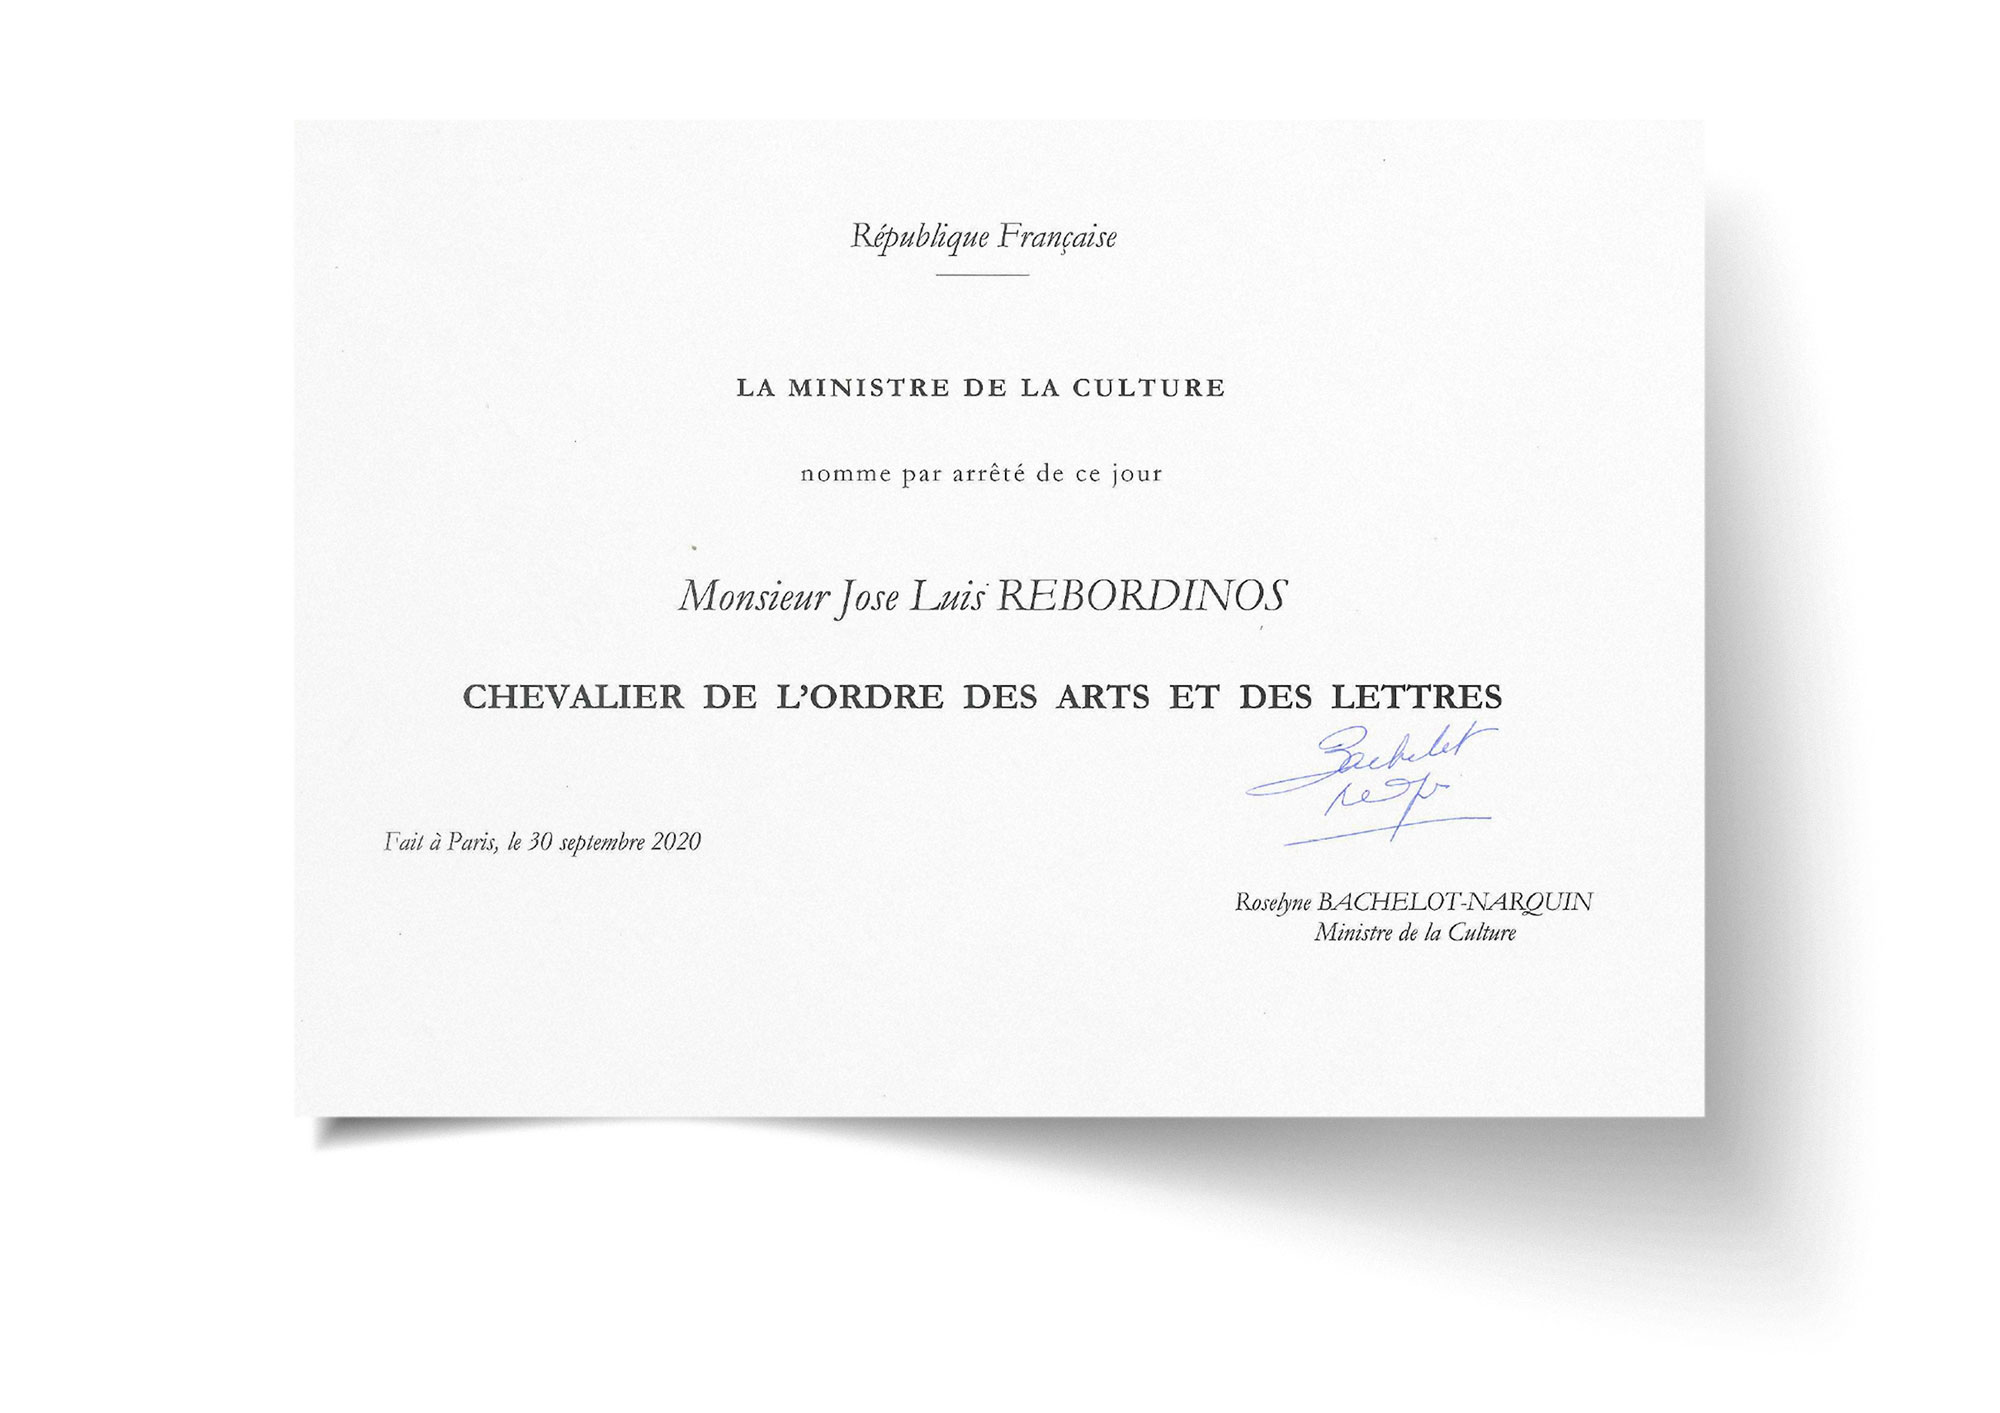 diploma_chevalier_2000.jpg